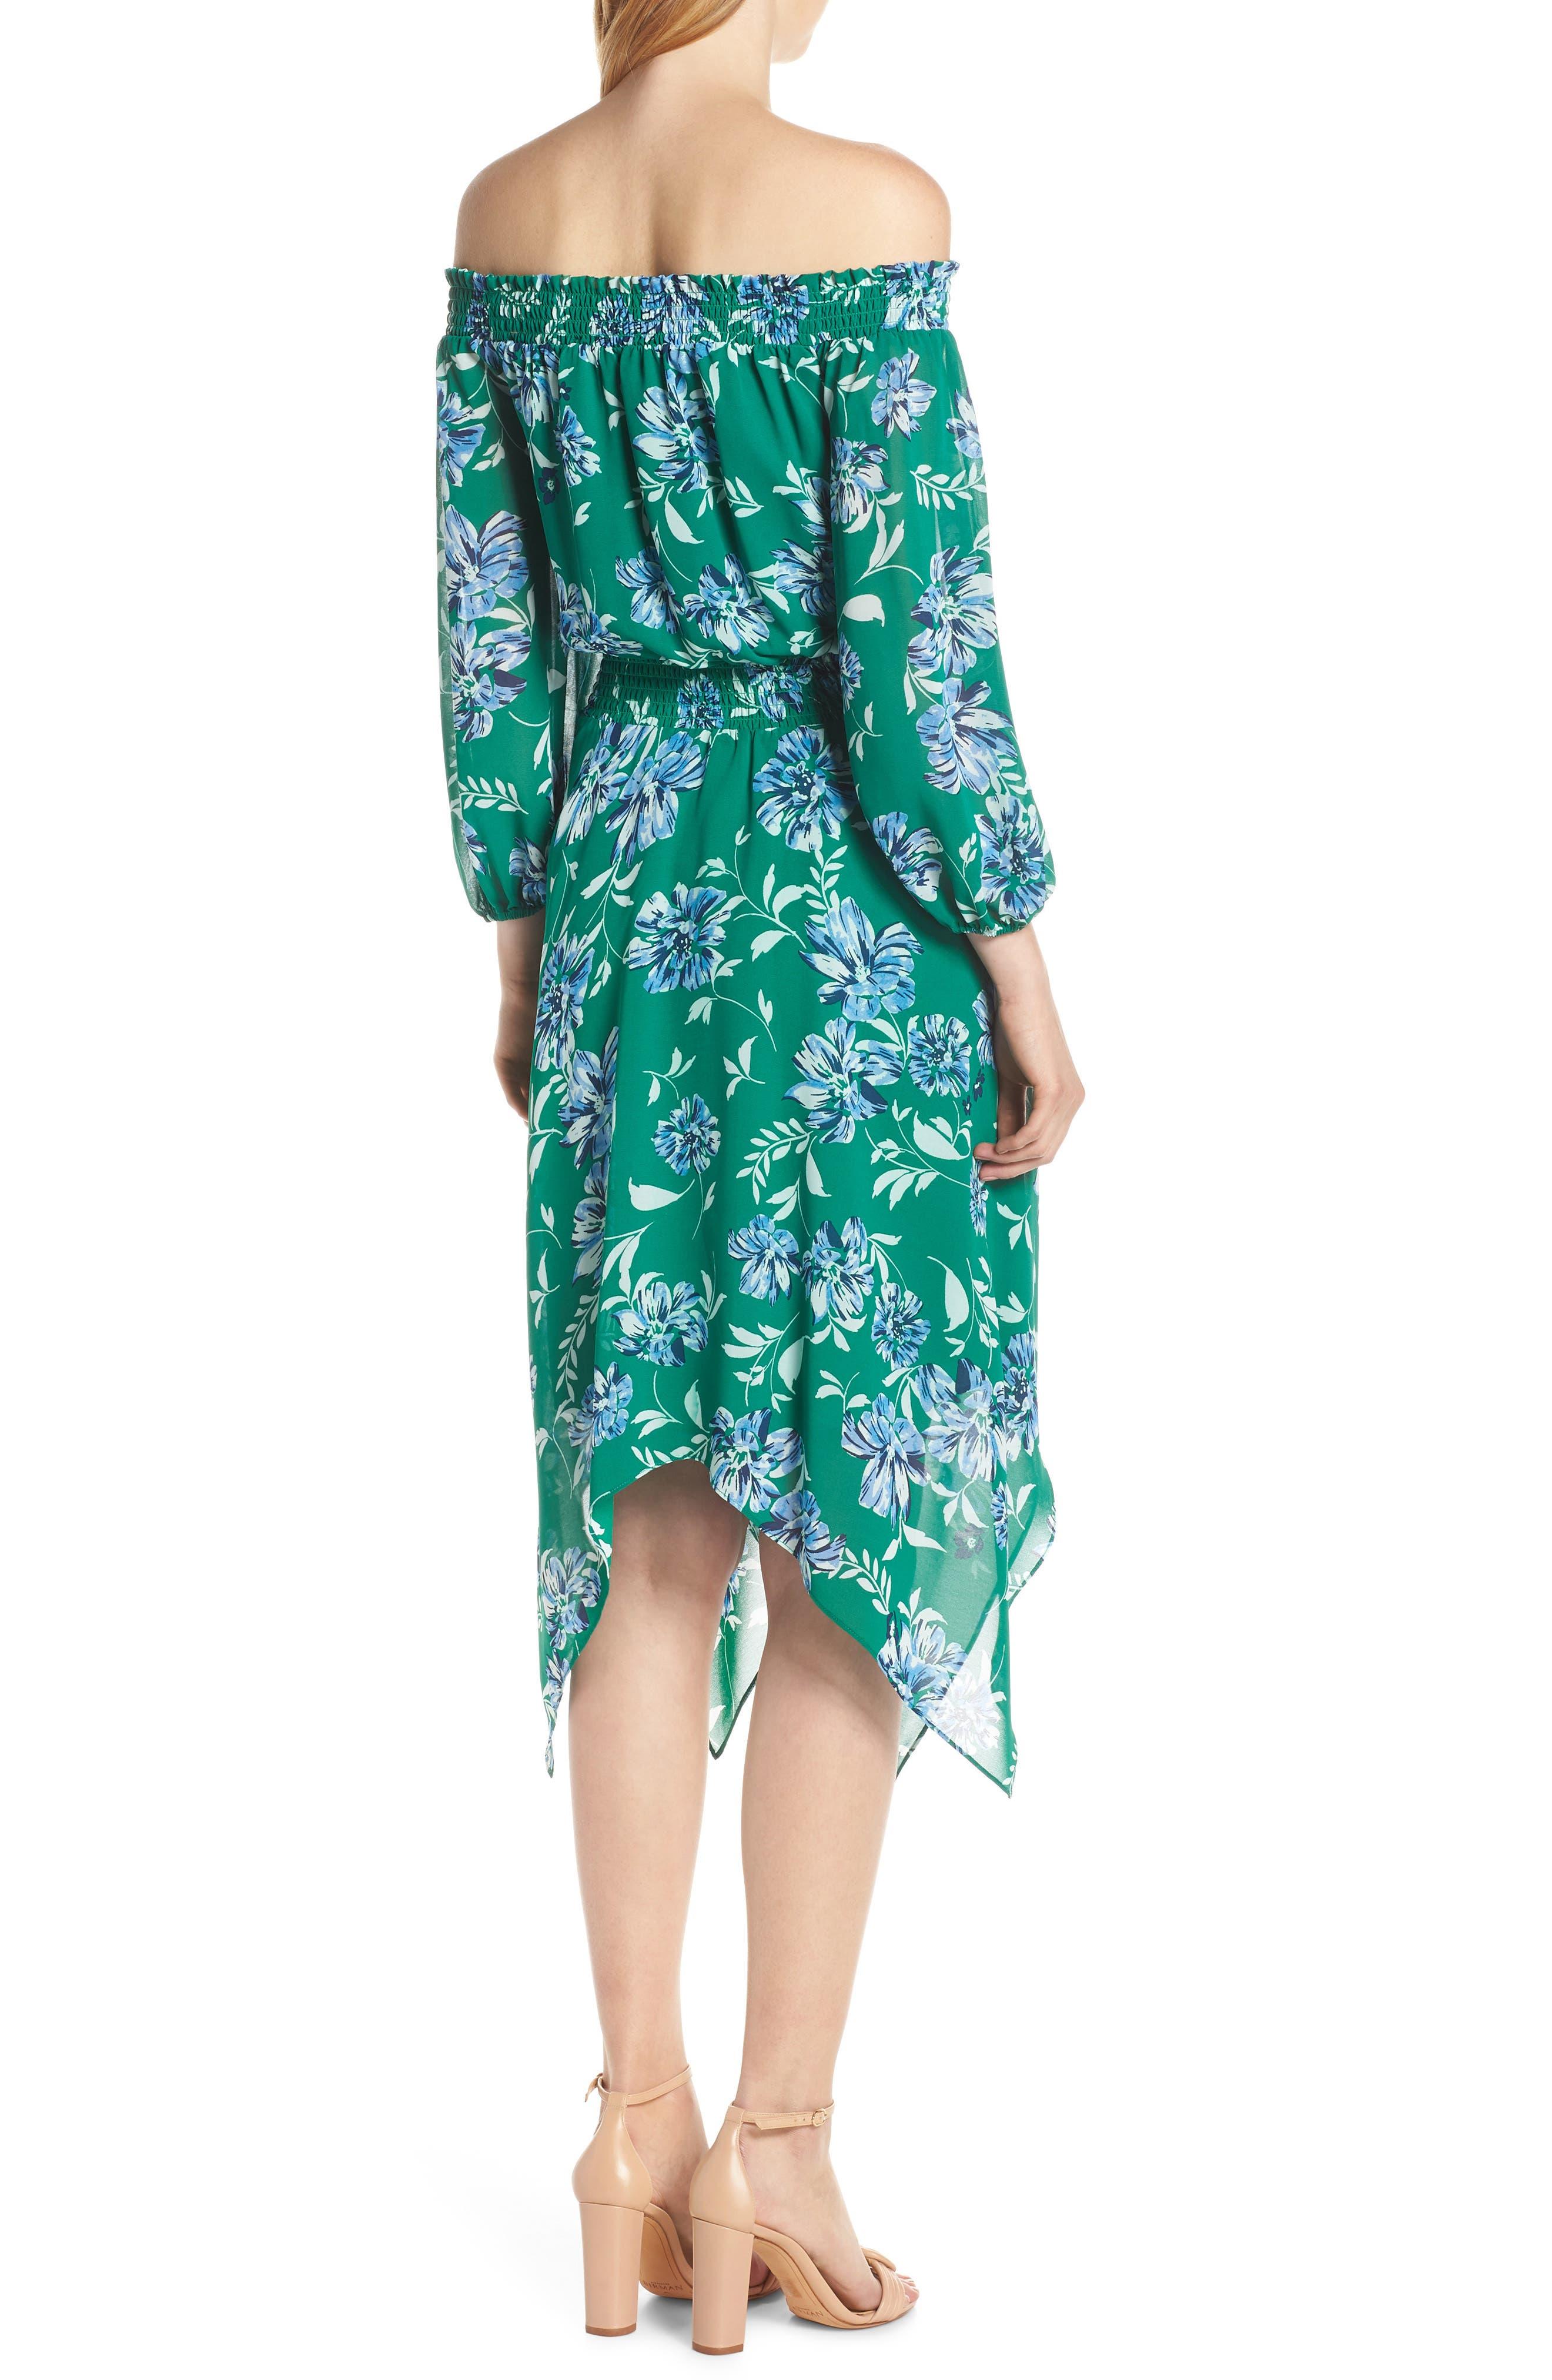 CHARLES HENRY, Smocked Handkerchief Hem Dress, Alternate thumbnail 2, color, KELLY GREEN FLORAL